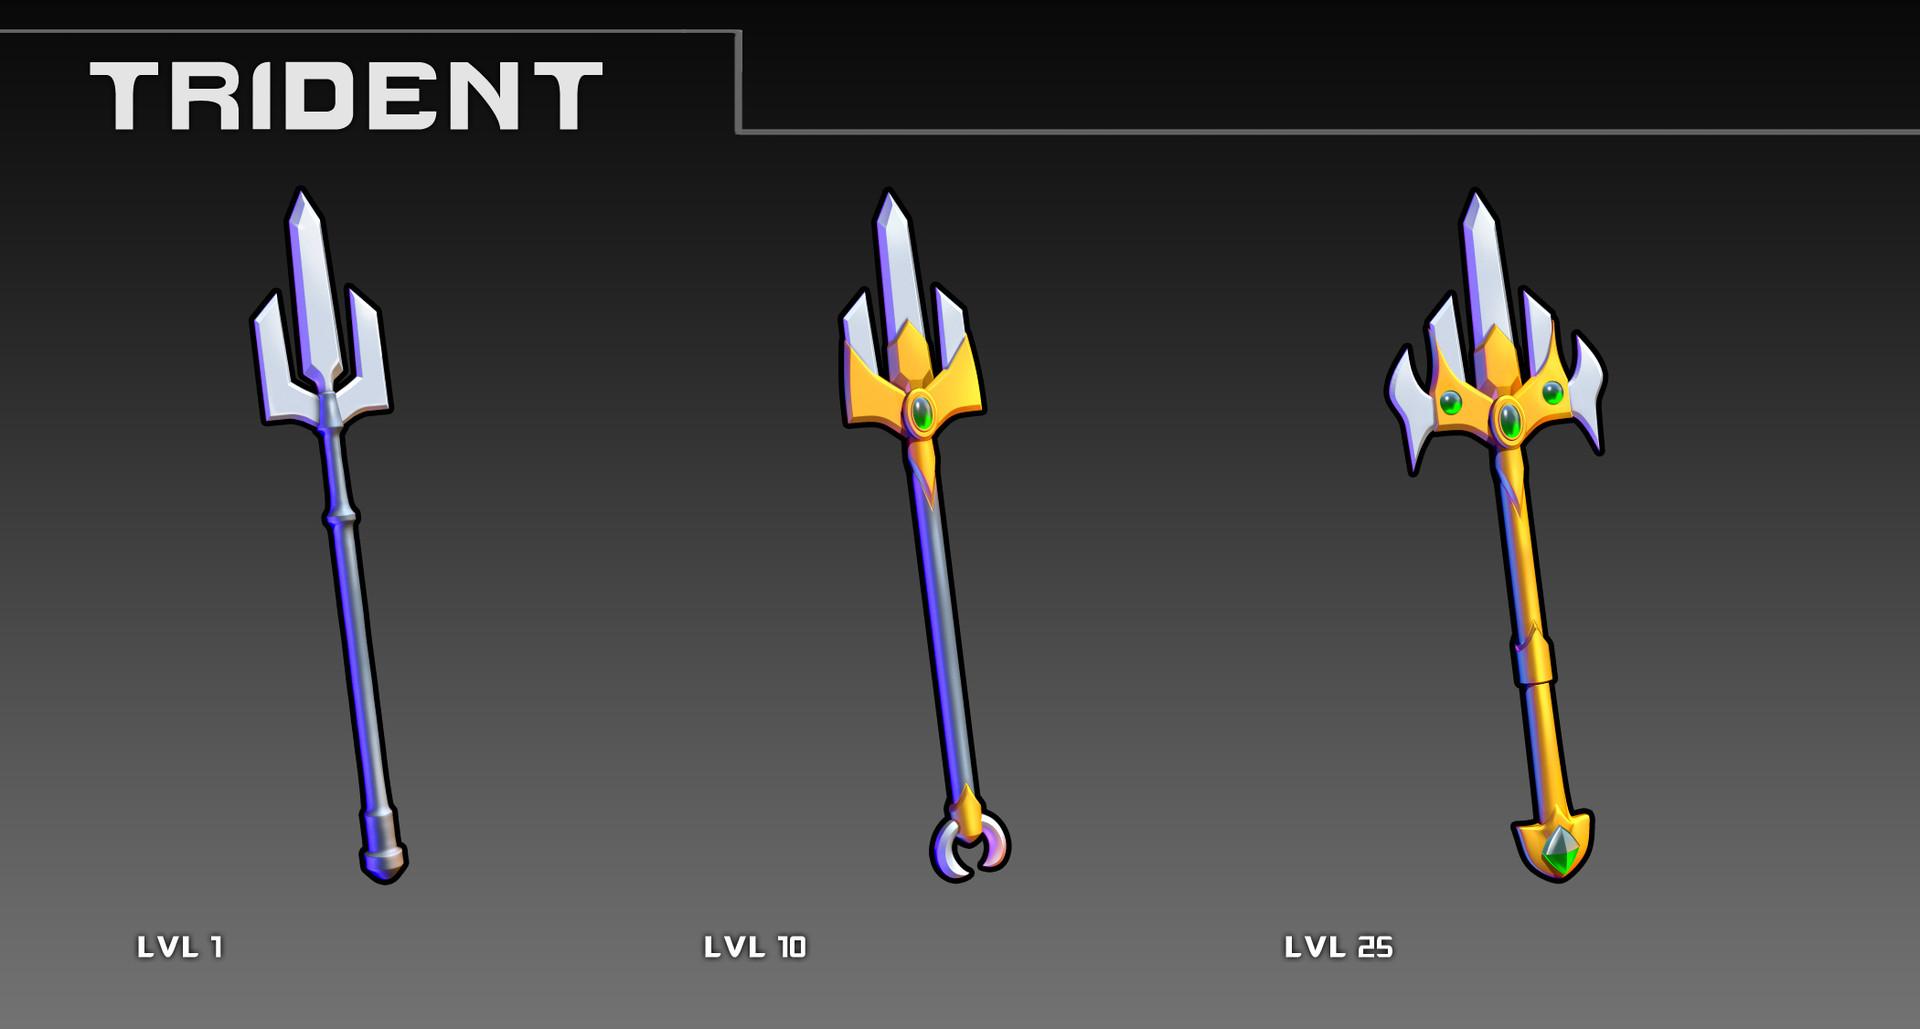 Jason rumpff item trident